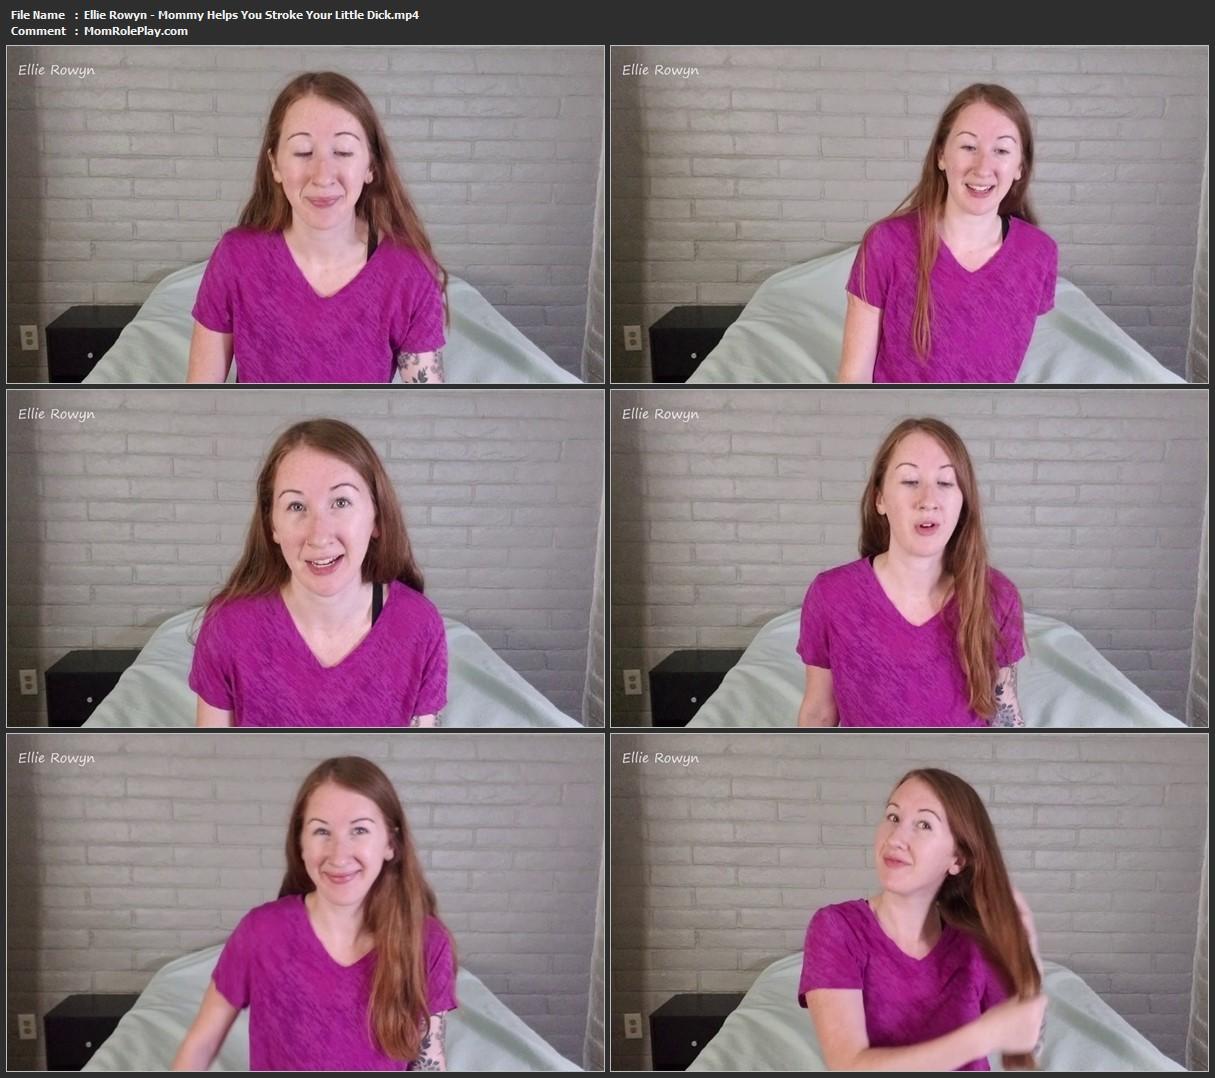 Ellie Rowyn - Mommy Helps You Stroke Your Little Dick